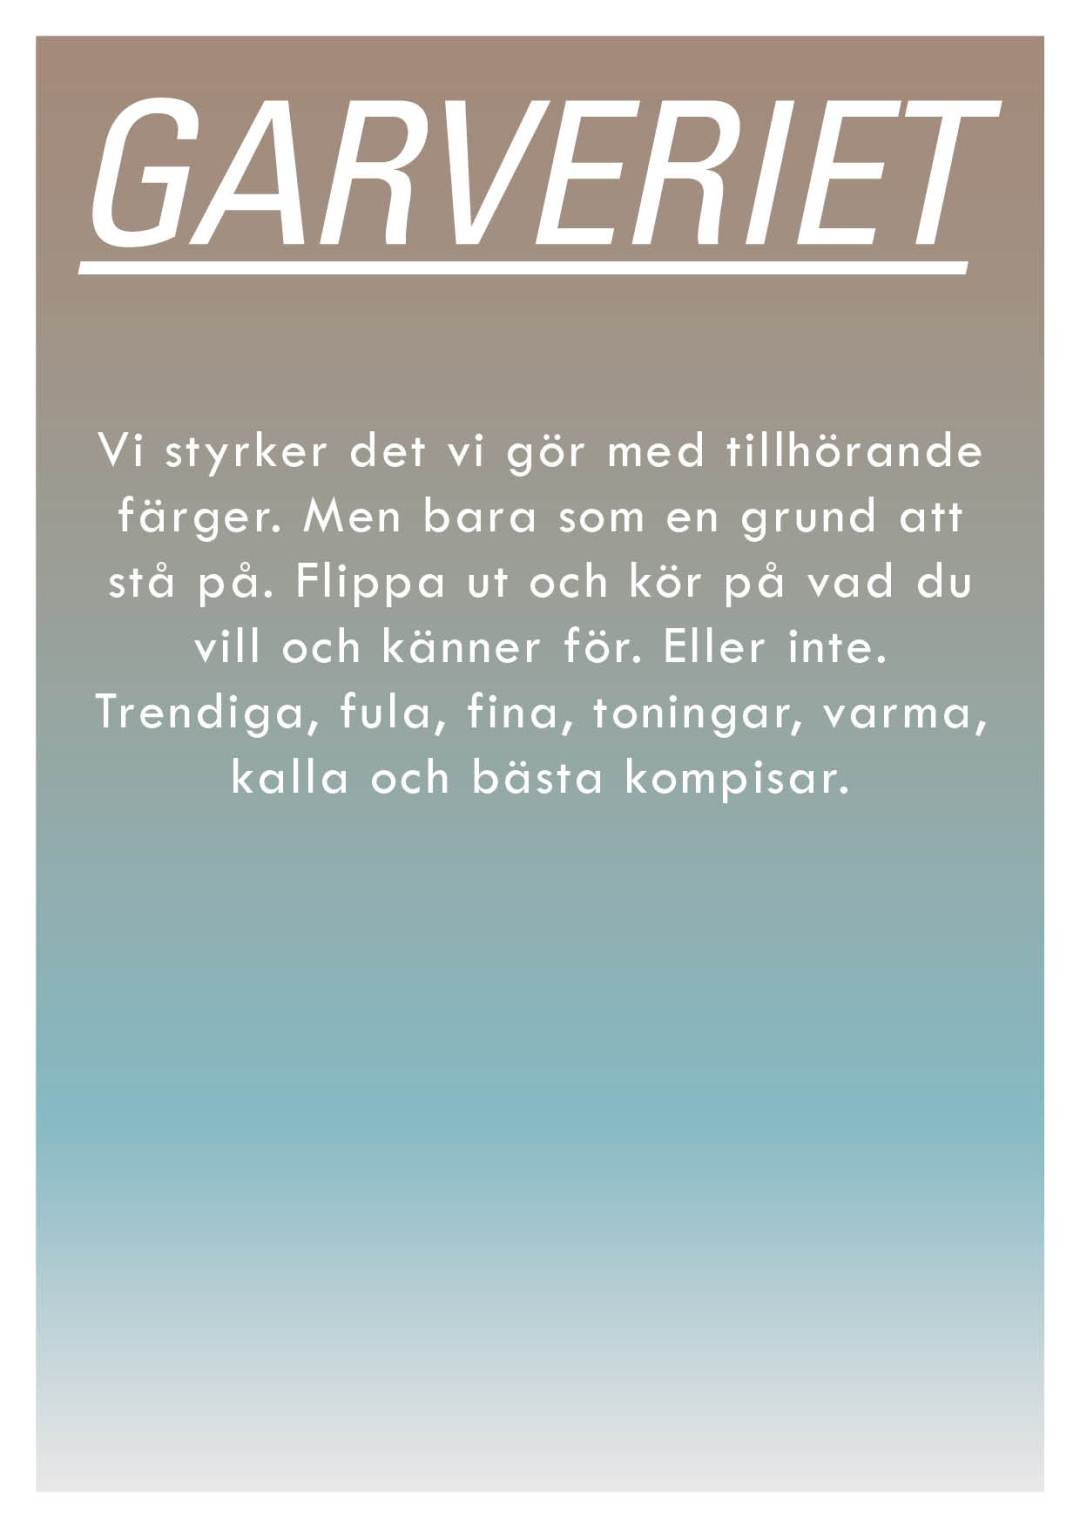 grafisk-profil-garveriet-20186